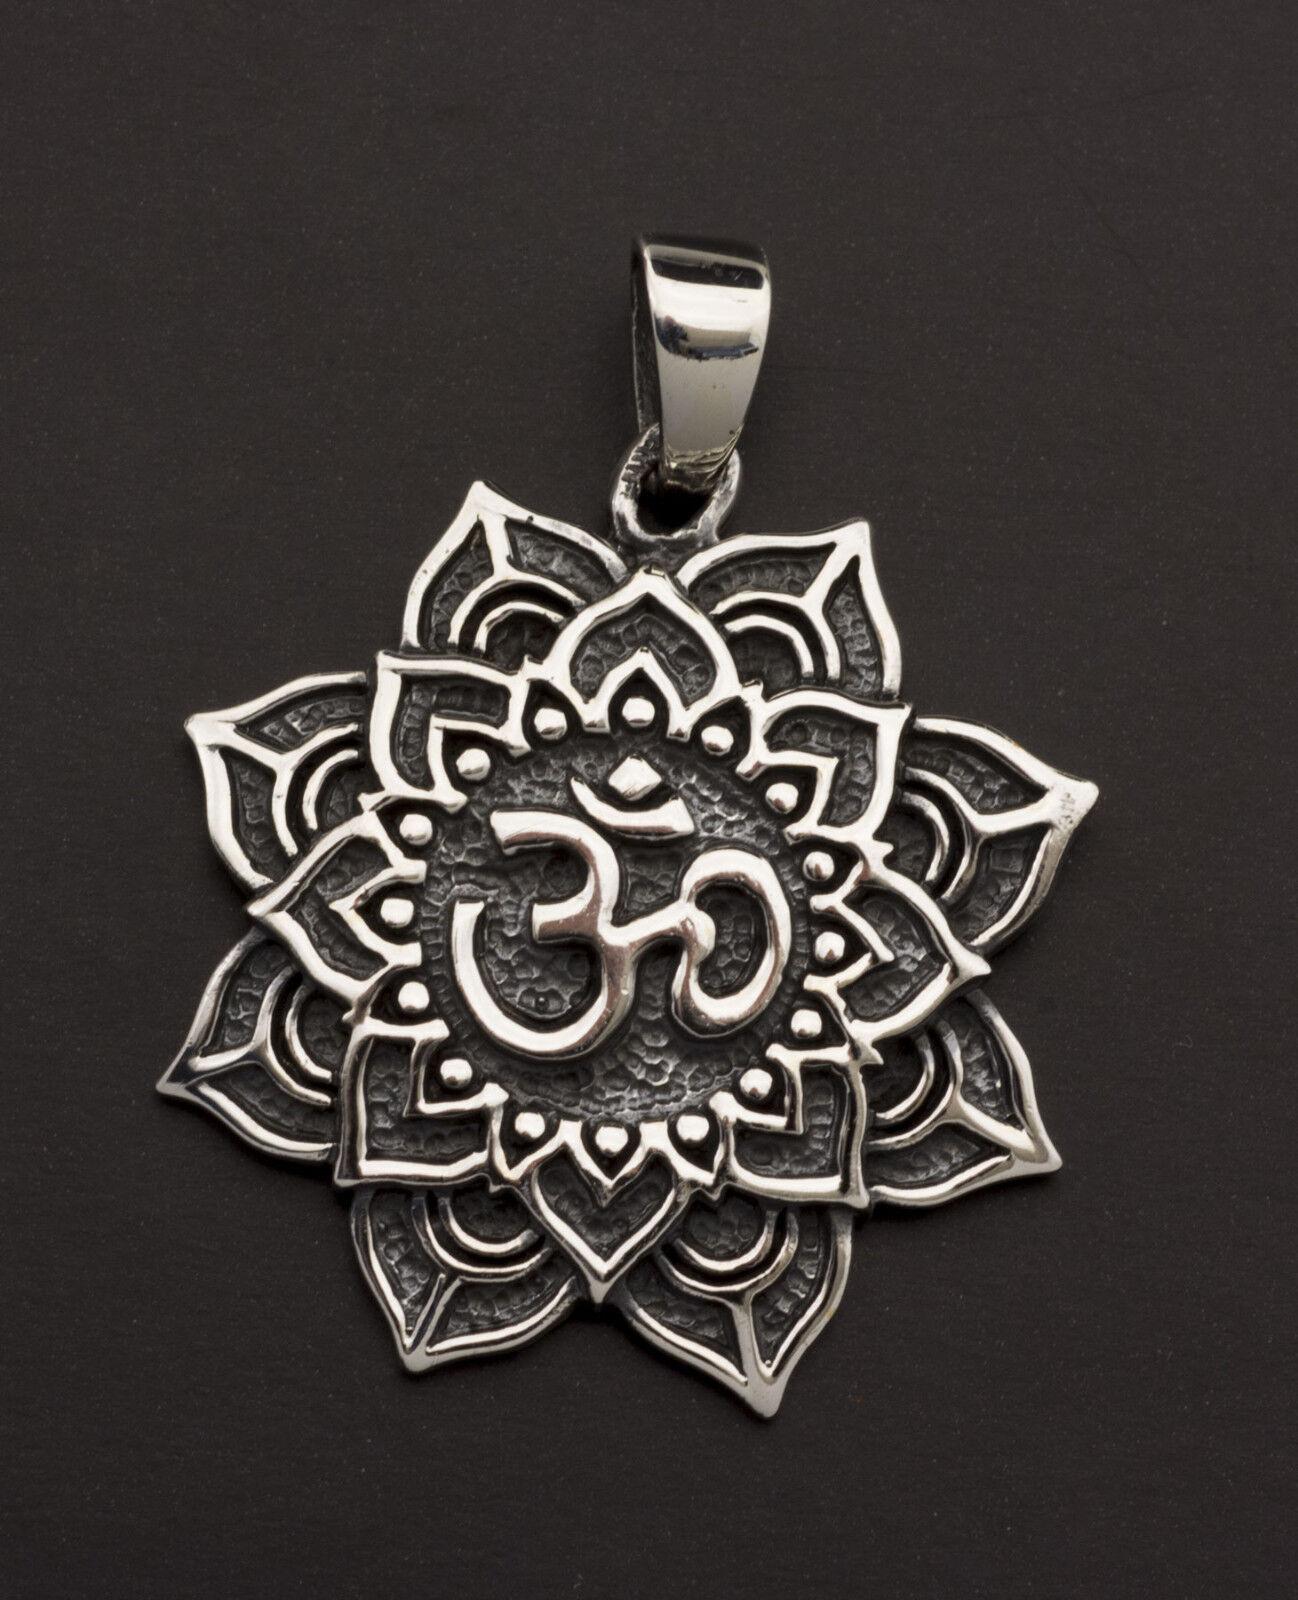 Pendentif tibetain Fleur Lotus Om silver massif 925 7g Bijoux Tibet 25852 K49